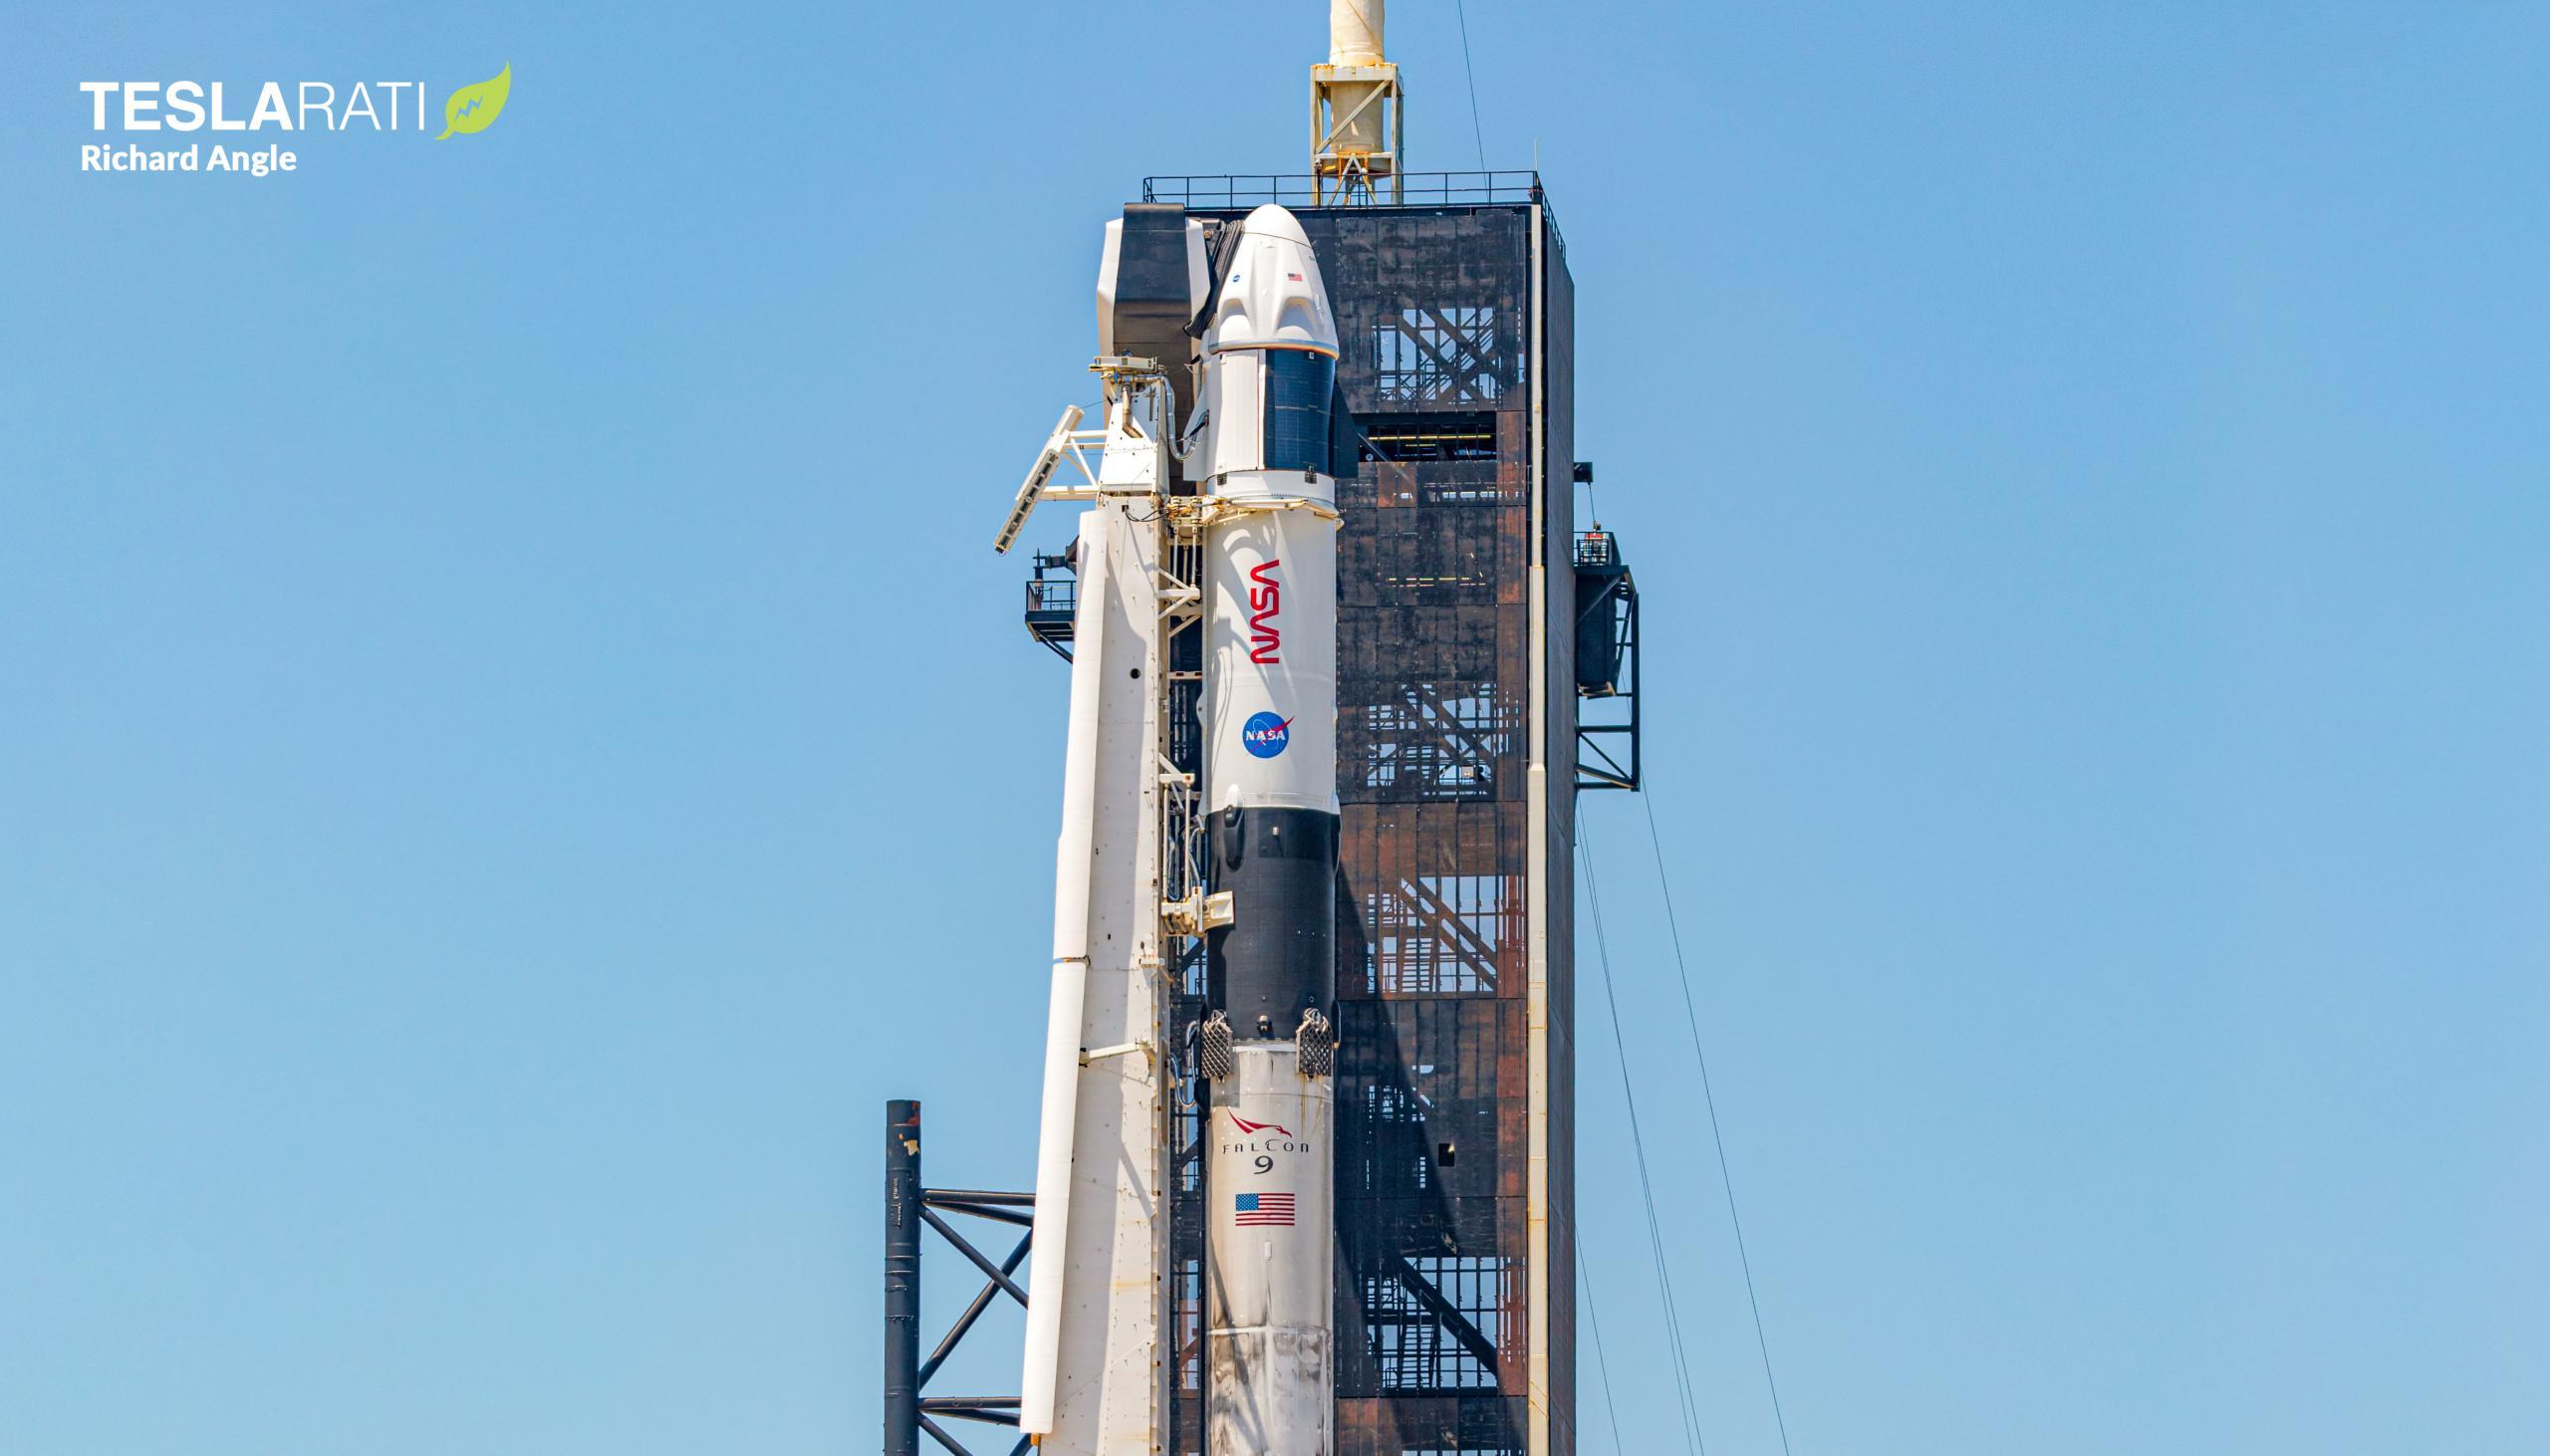 Crew-2 Crew Dragon C206 Falcon 9 B1061 39A 042221 (Richard Angle) 5 crop 2 (c)